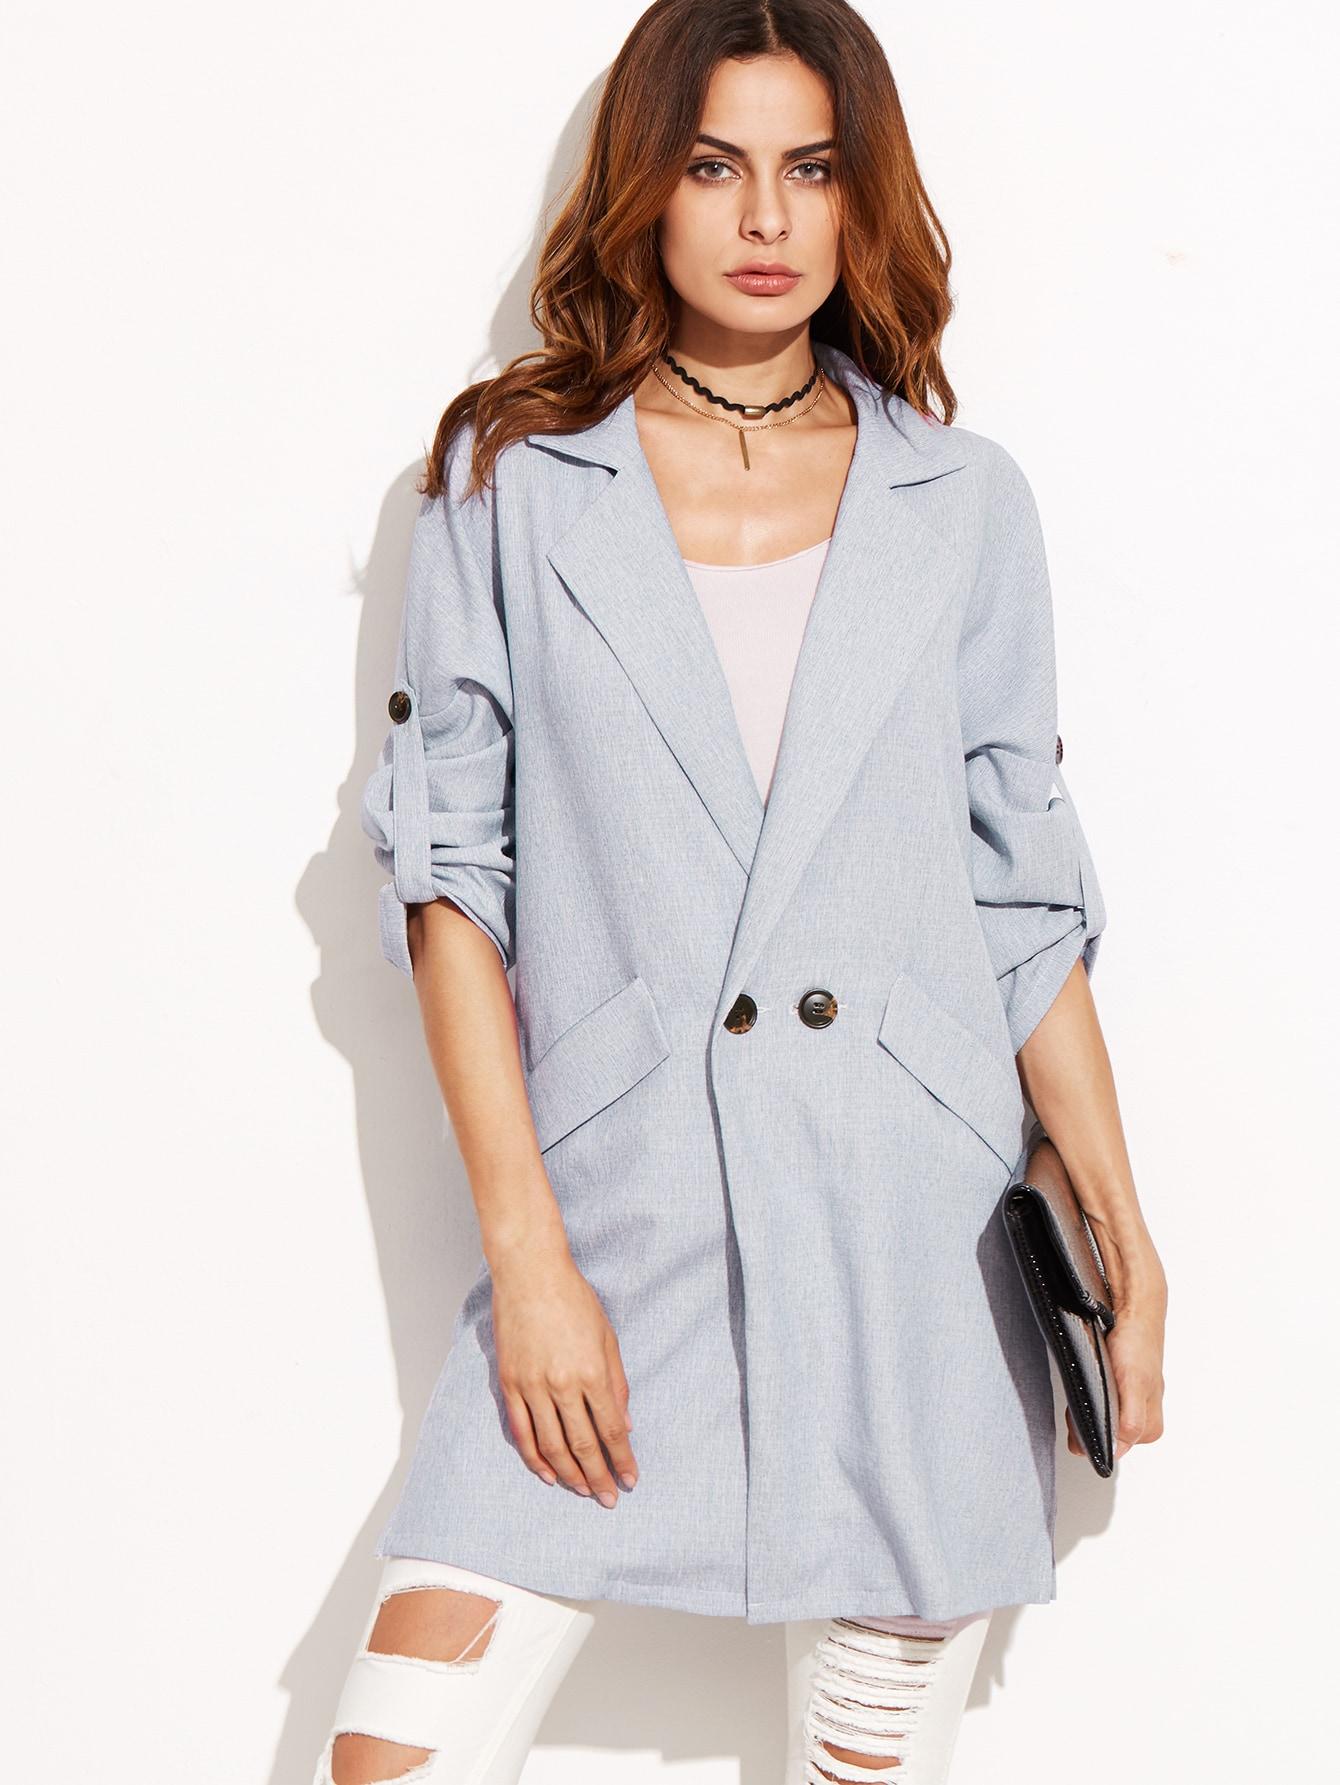 Blue Drop Shoulder Roll Tab Sleeve CoatBlue Drop Shoulder Roll Tab Sleeve Coat<br><br>color: Blue<br>size: S,XS